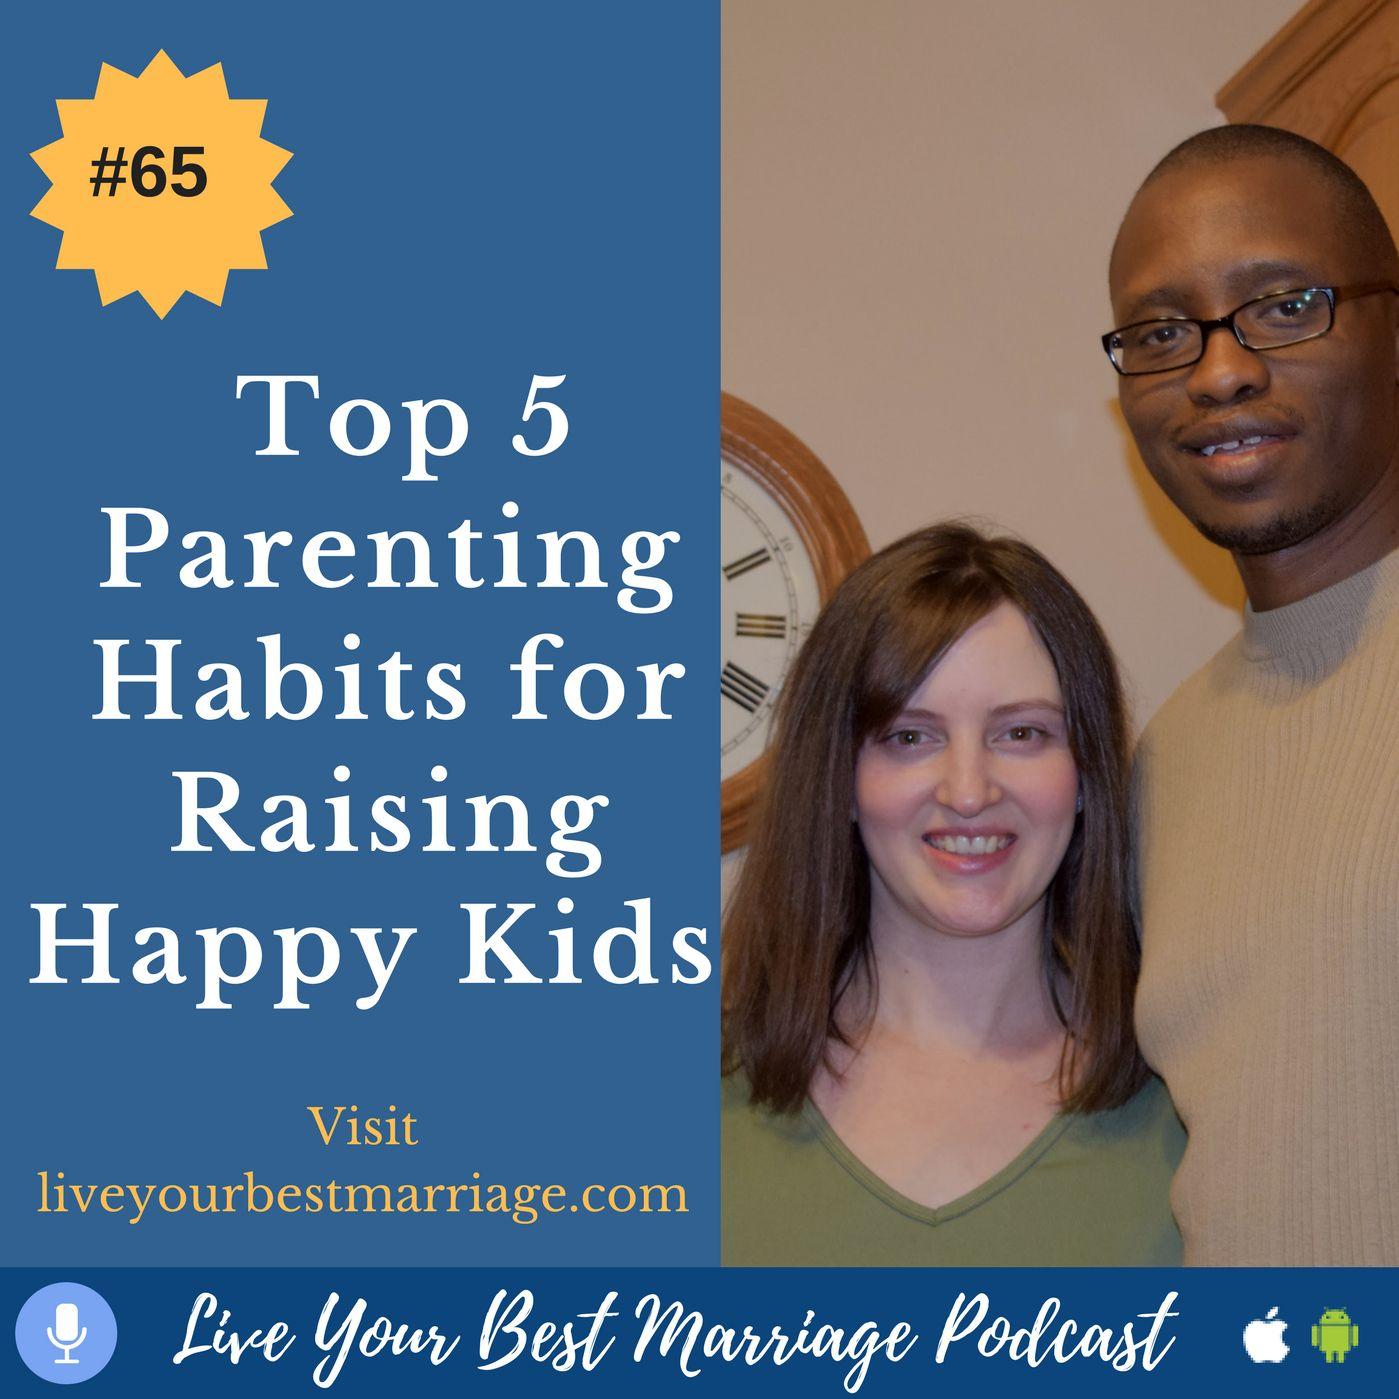 episode-65-top-5-parenting-habits-for-raising-happy-kids_thumbnail.png